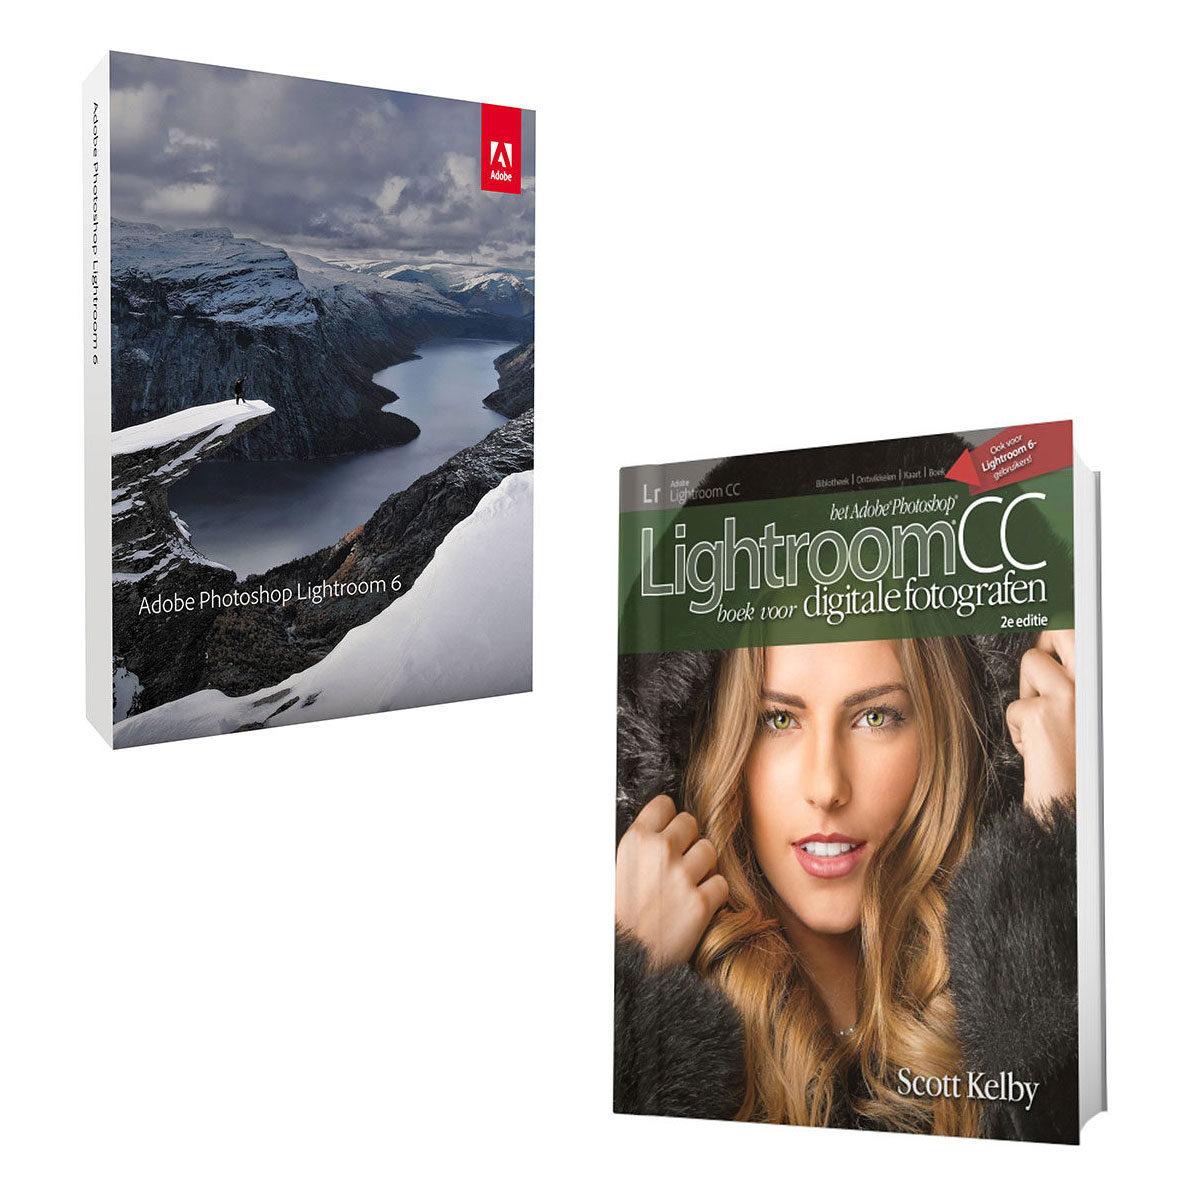 Foto van Adobe Photoshop Lightroom 6 NL Mac / Windows + Het Adobe Photoshop Lightroom CC boek voor digitale fotografen, 2e editie